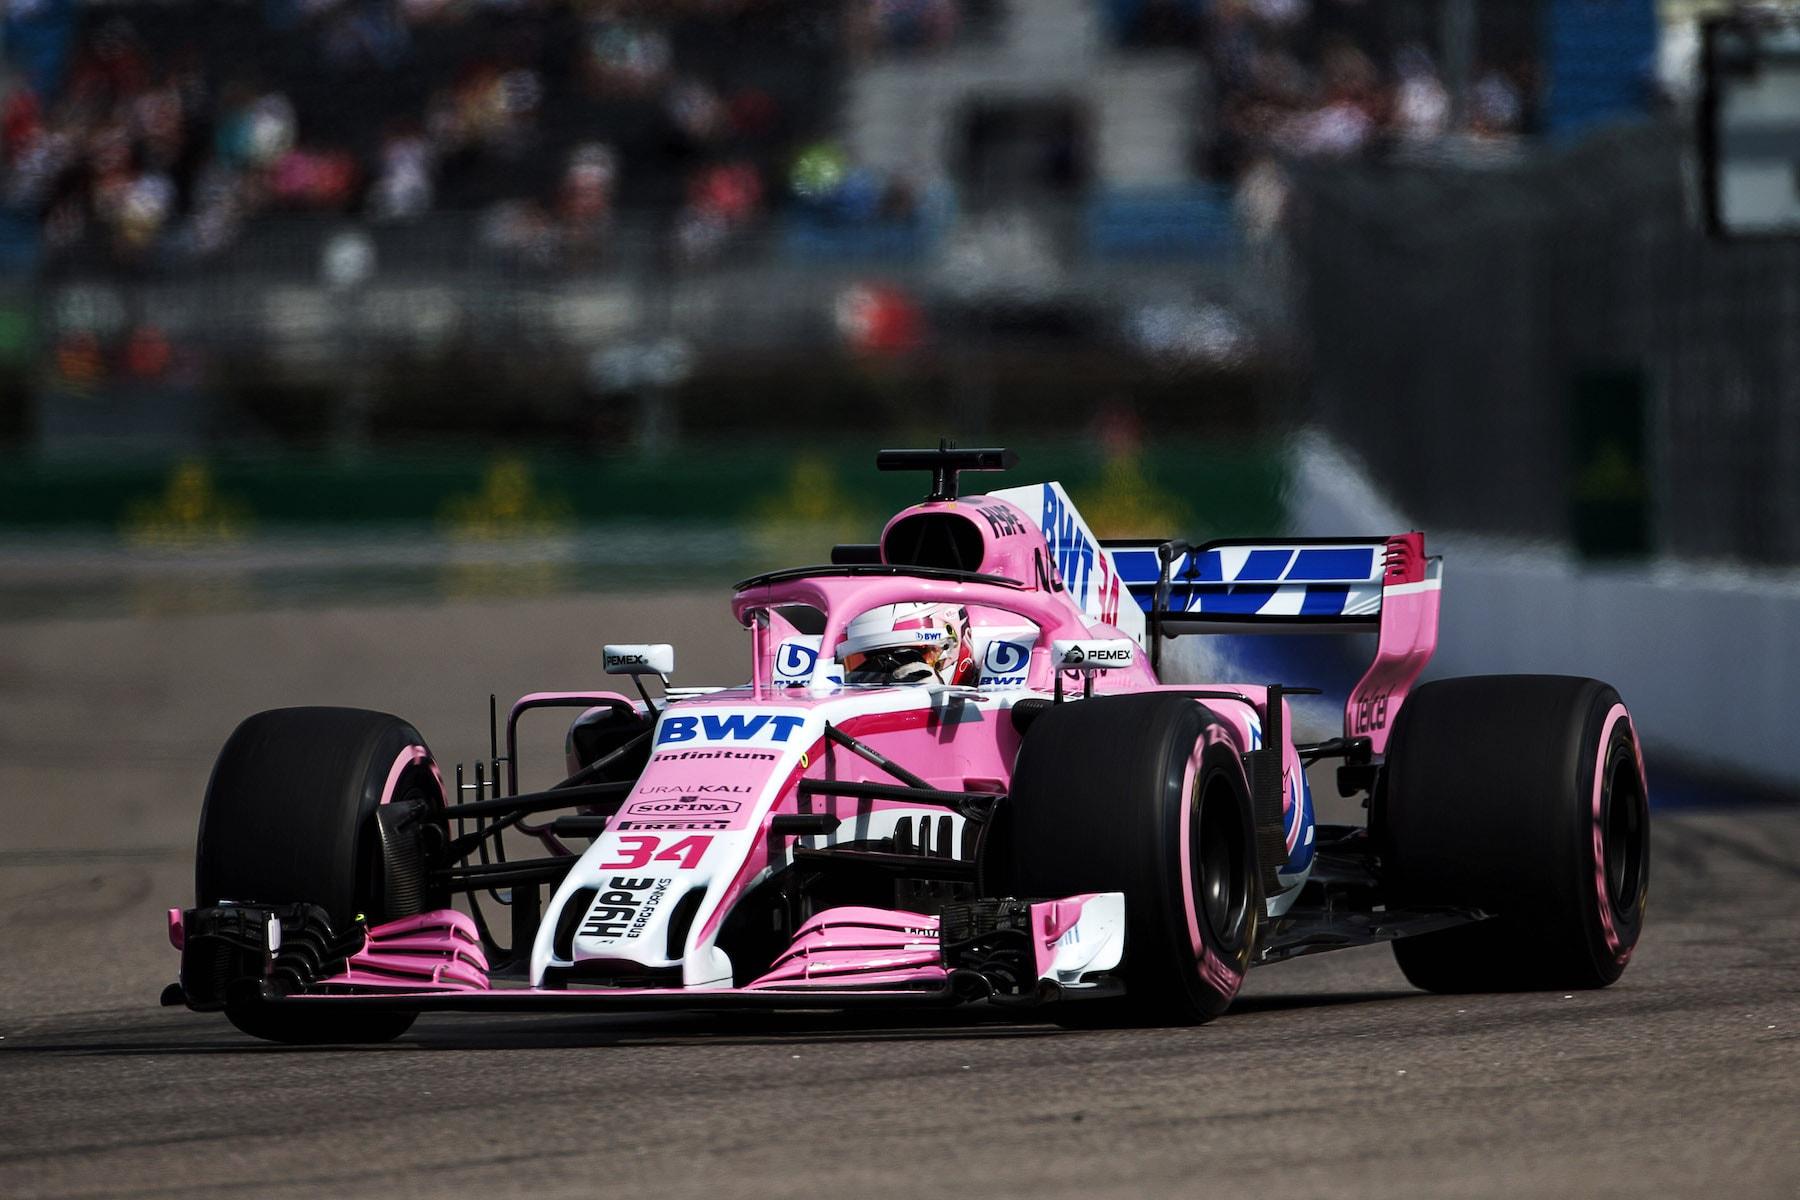 2018 Nicolas Latifi | Force India VJM11 | 2018 Russian GP FP1 2 copy.jpg